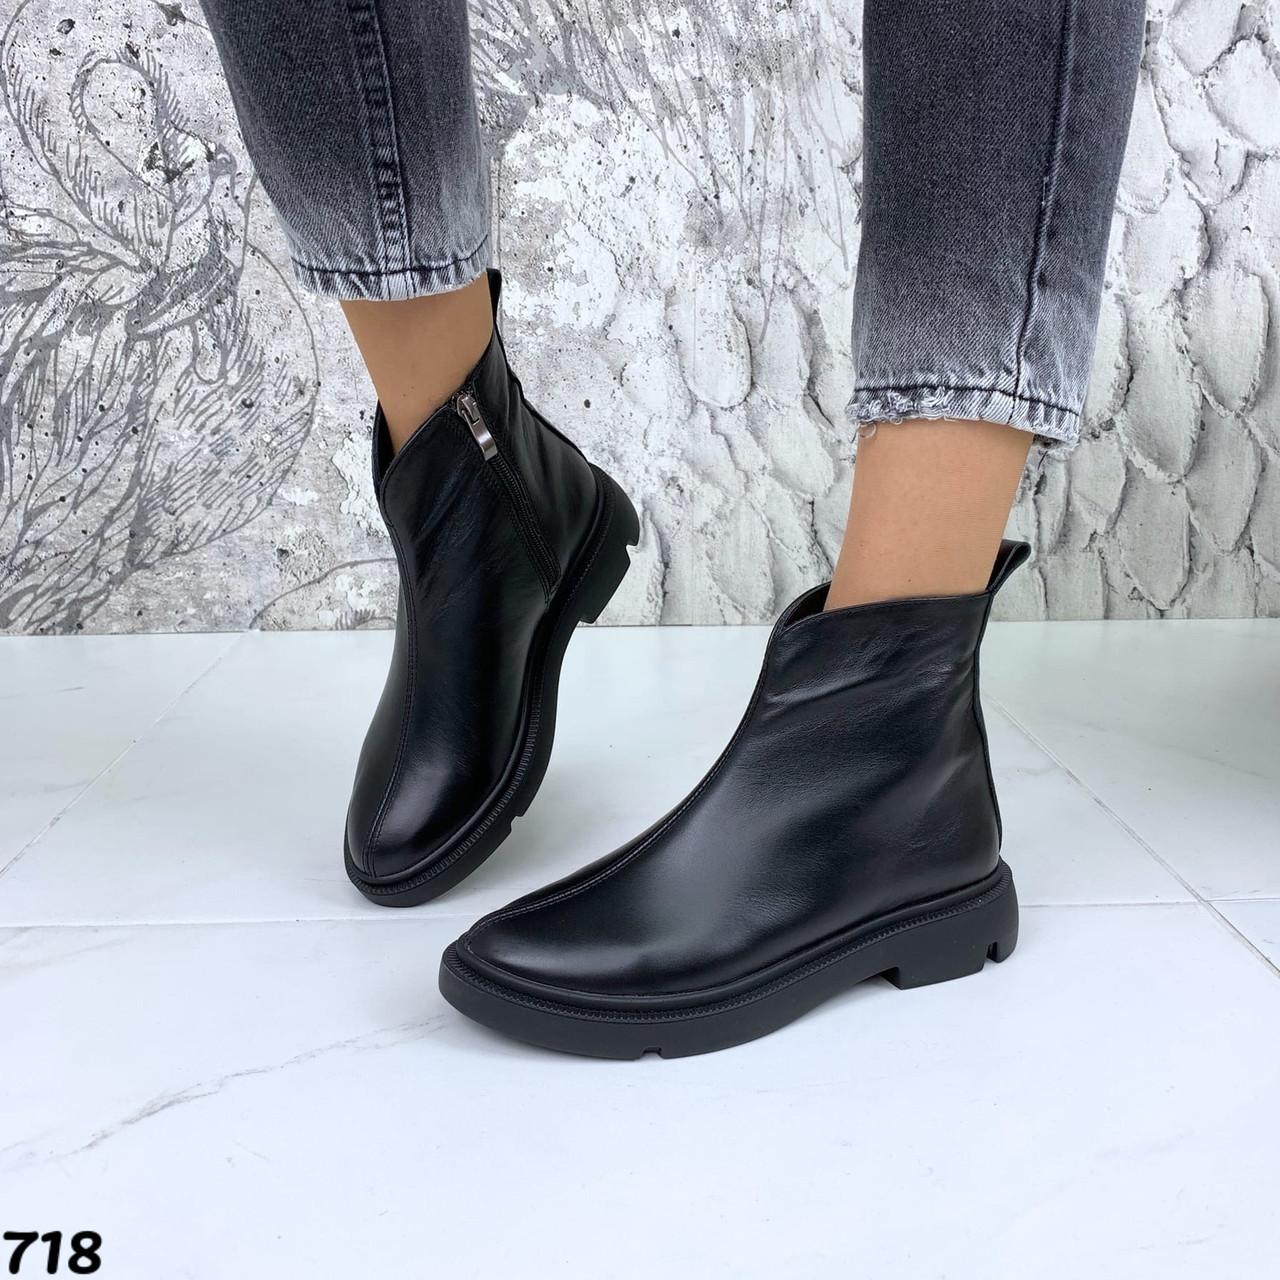 Ботинки женские натур кожа Деми 718